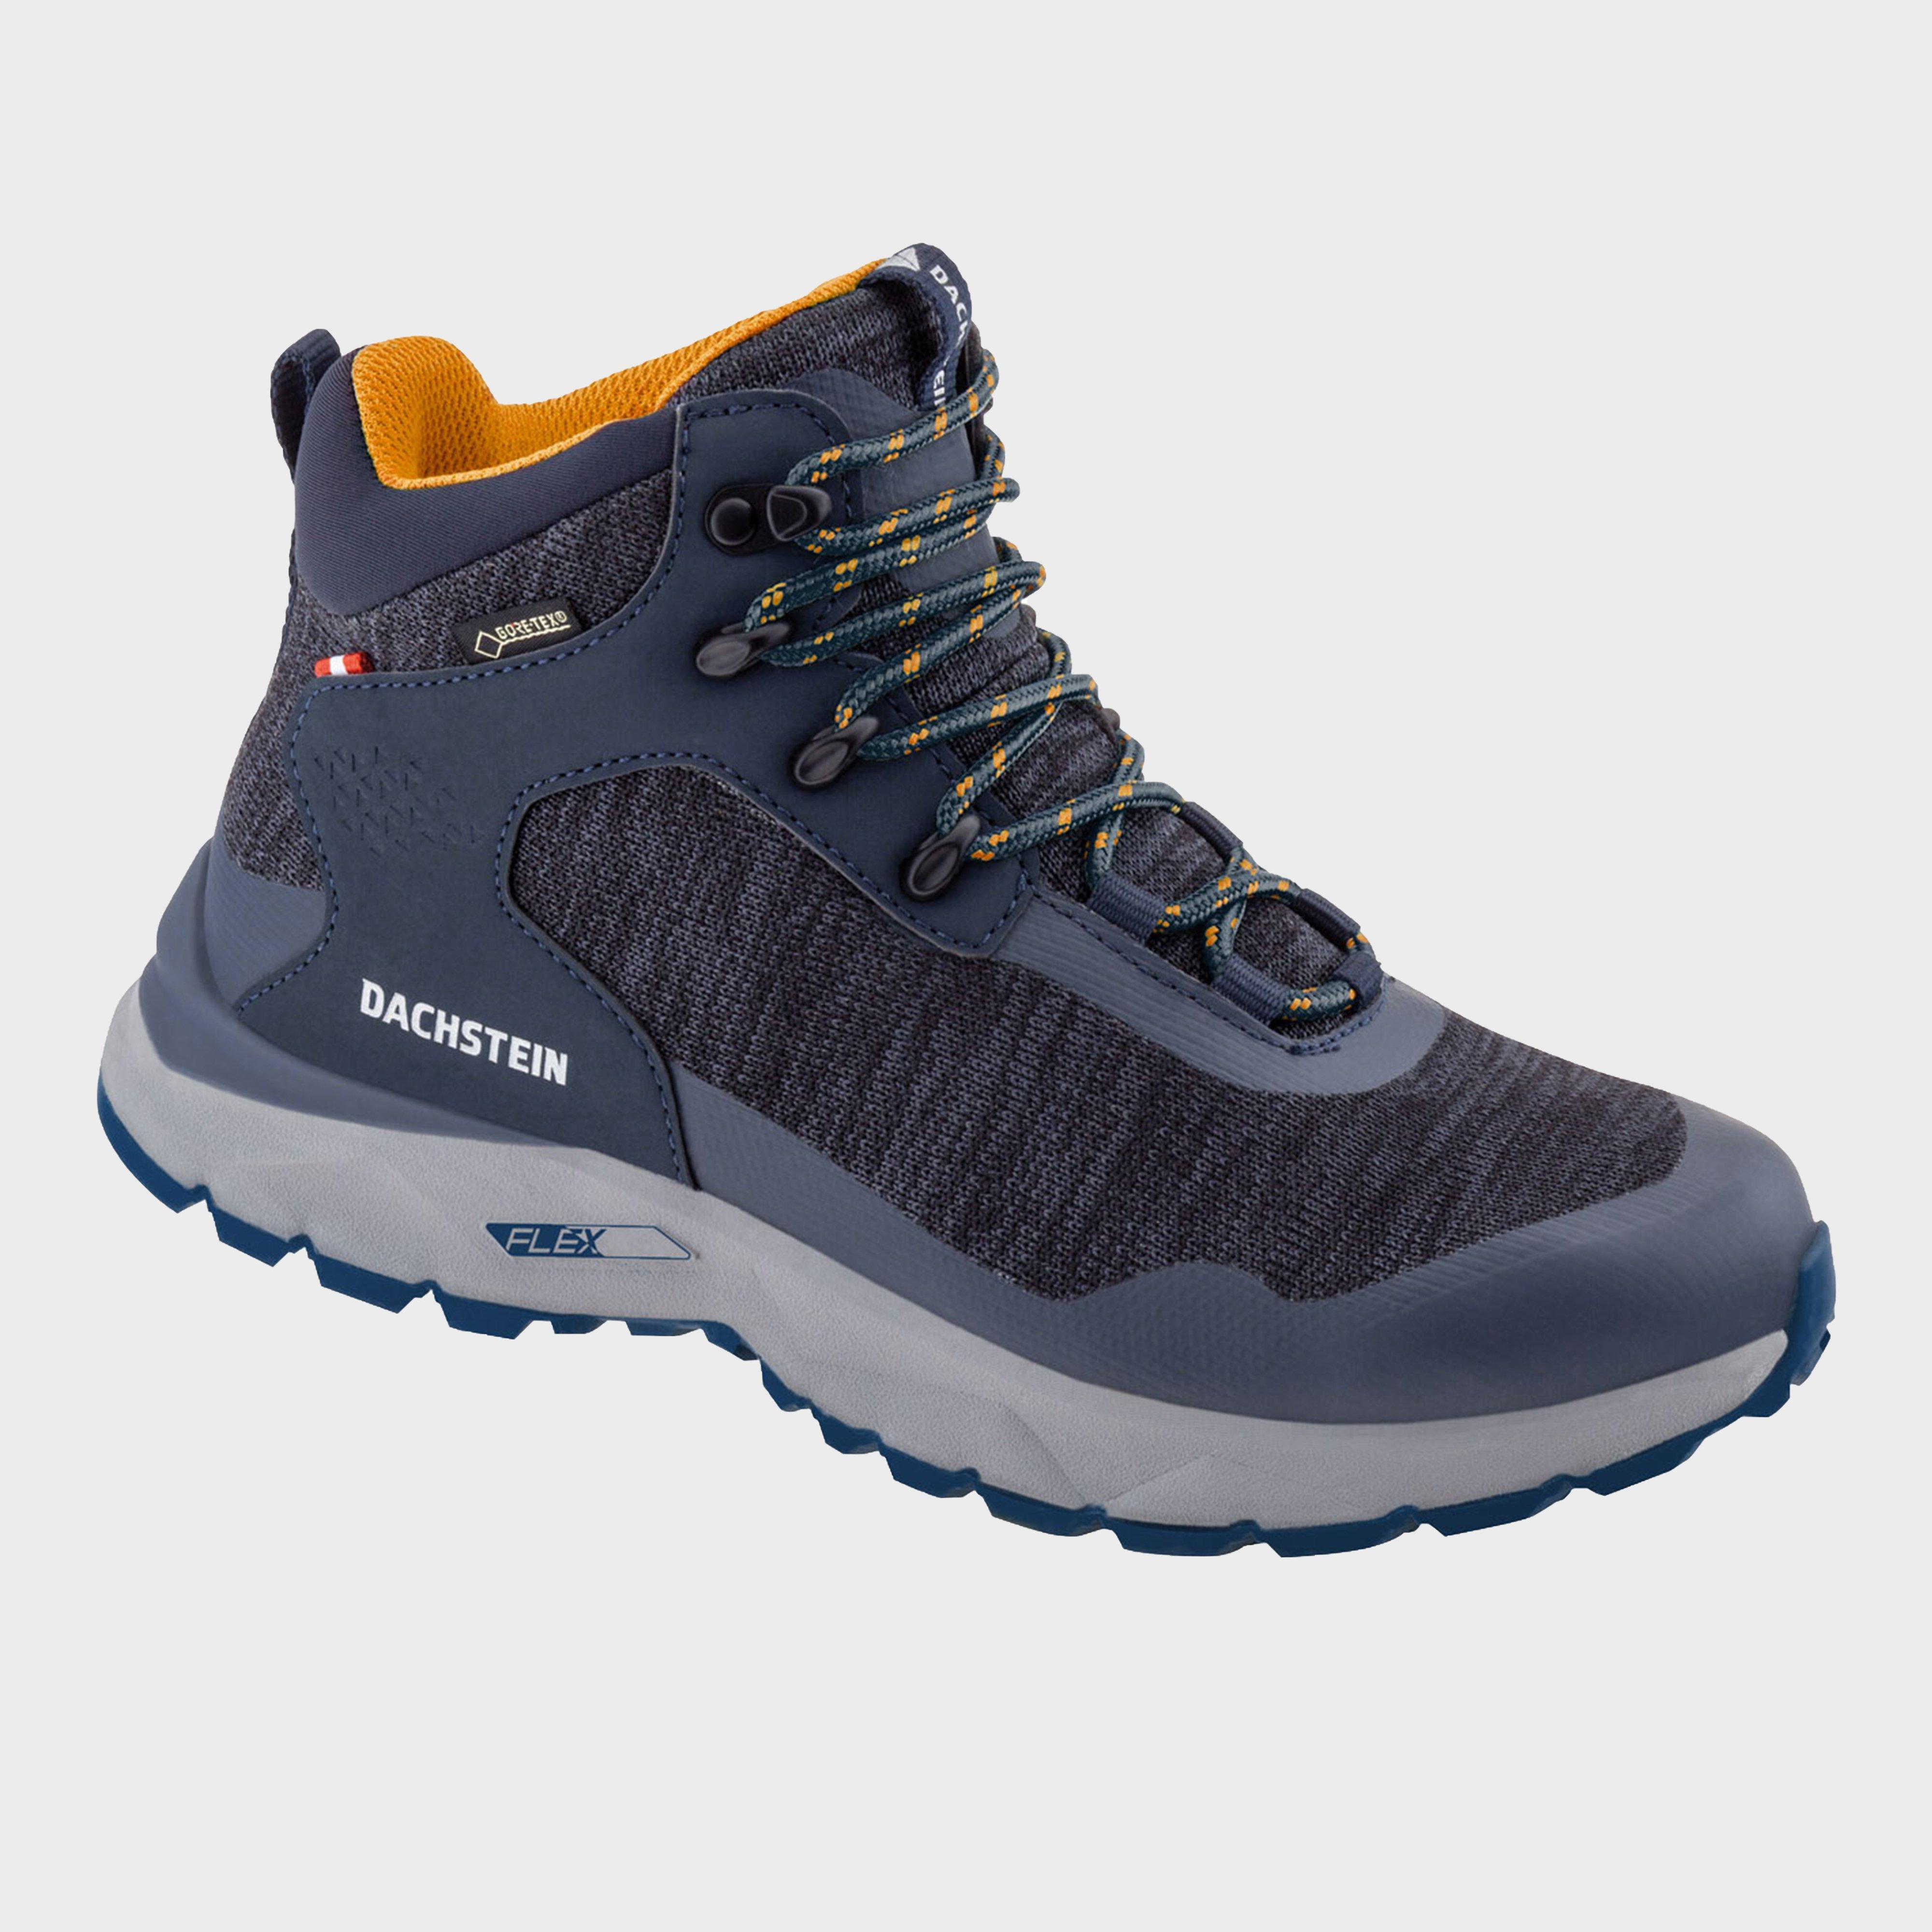 Dachstein Dachstein Mens Gaisberg GTX Walking Boots